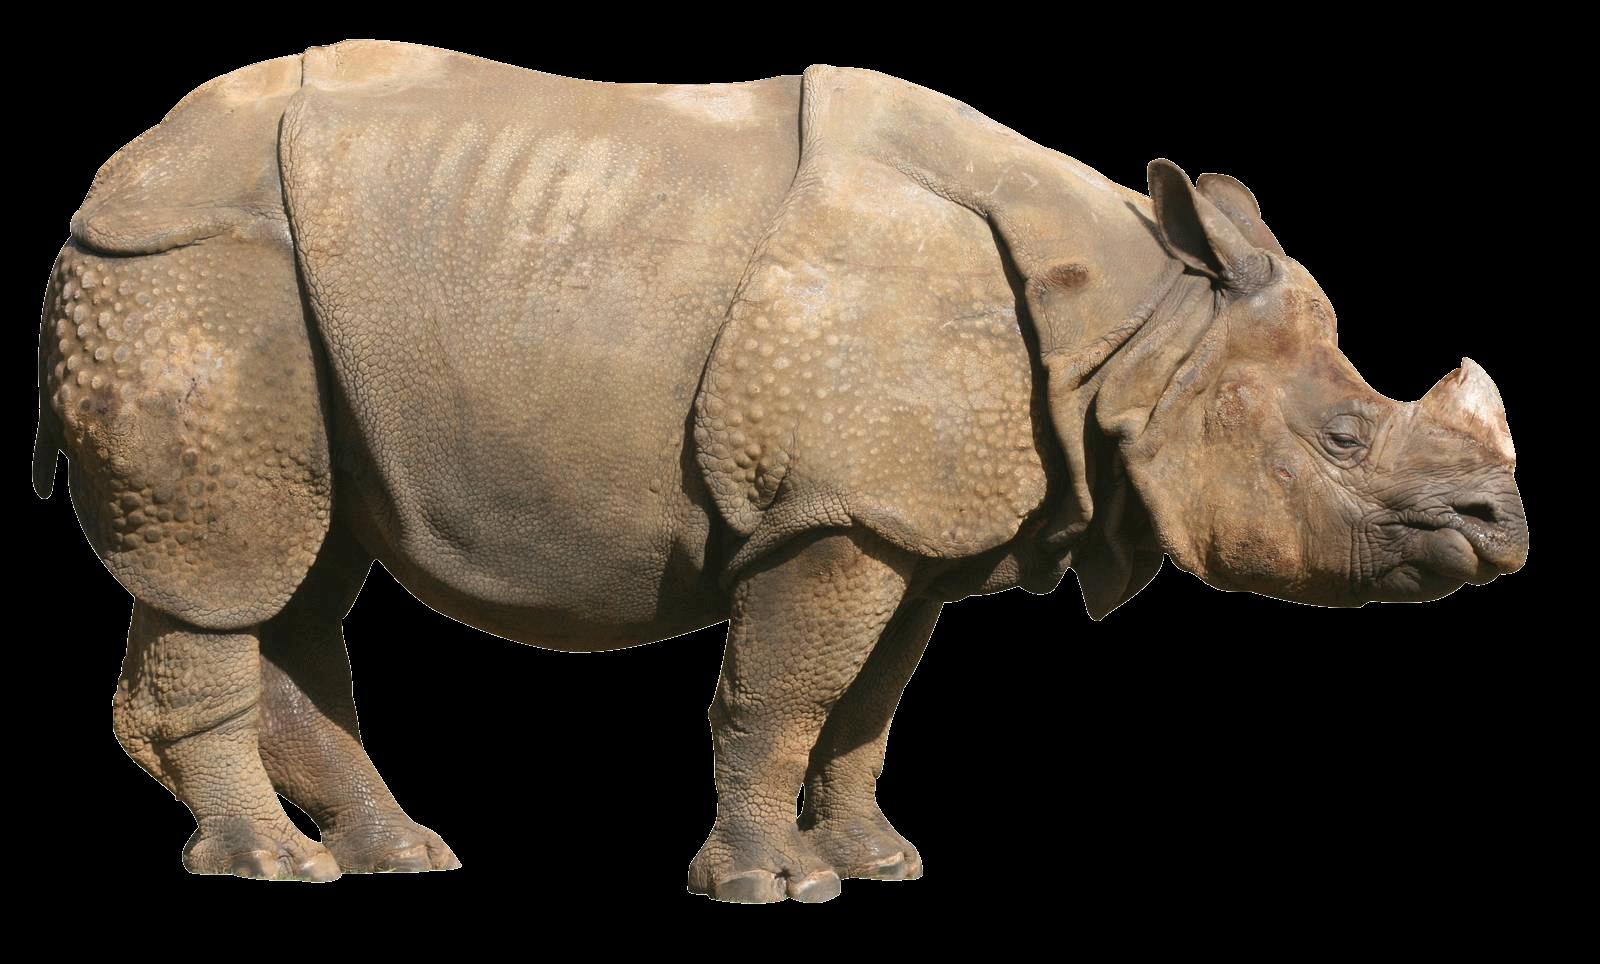 Download · animals · rhinoceros - Rhinoceros PNG